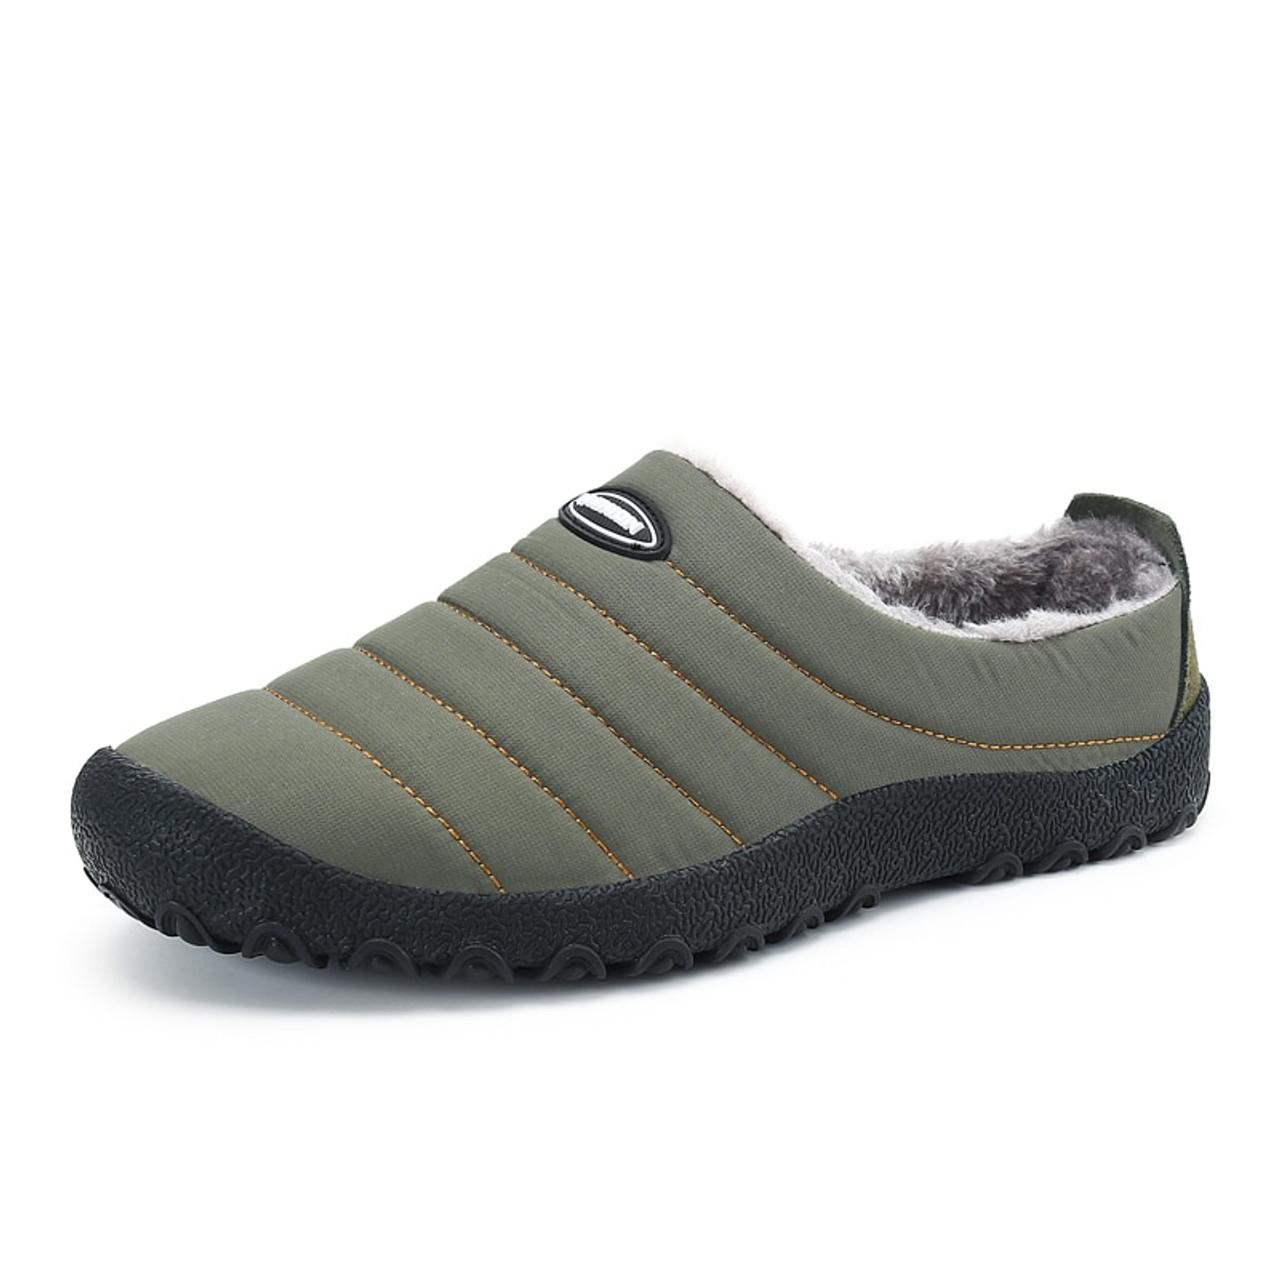 b6cb39710e44 ... Christmas Winter Men Shoes Warm Plush Home Slippers Men Flip Flops  Indoor Slippers Waterproof Outdoor Shoes ...